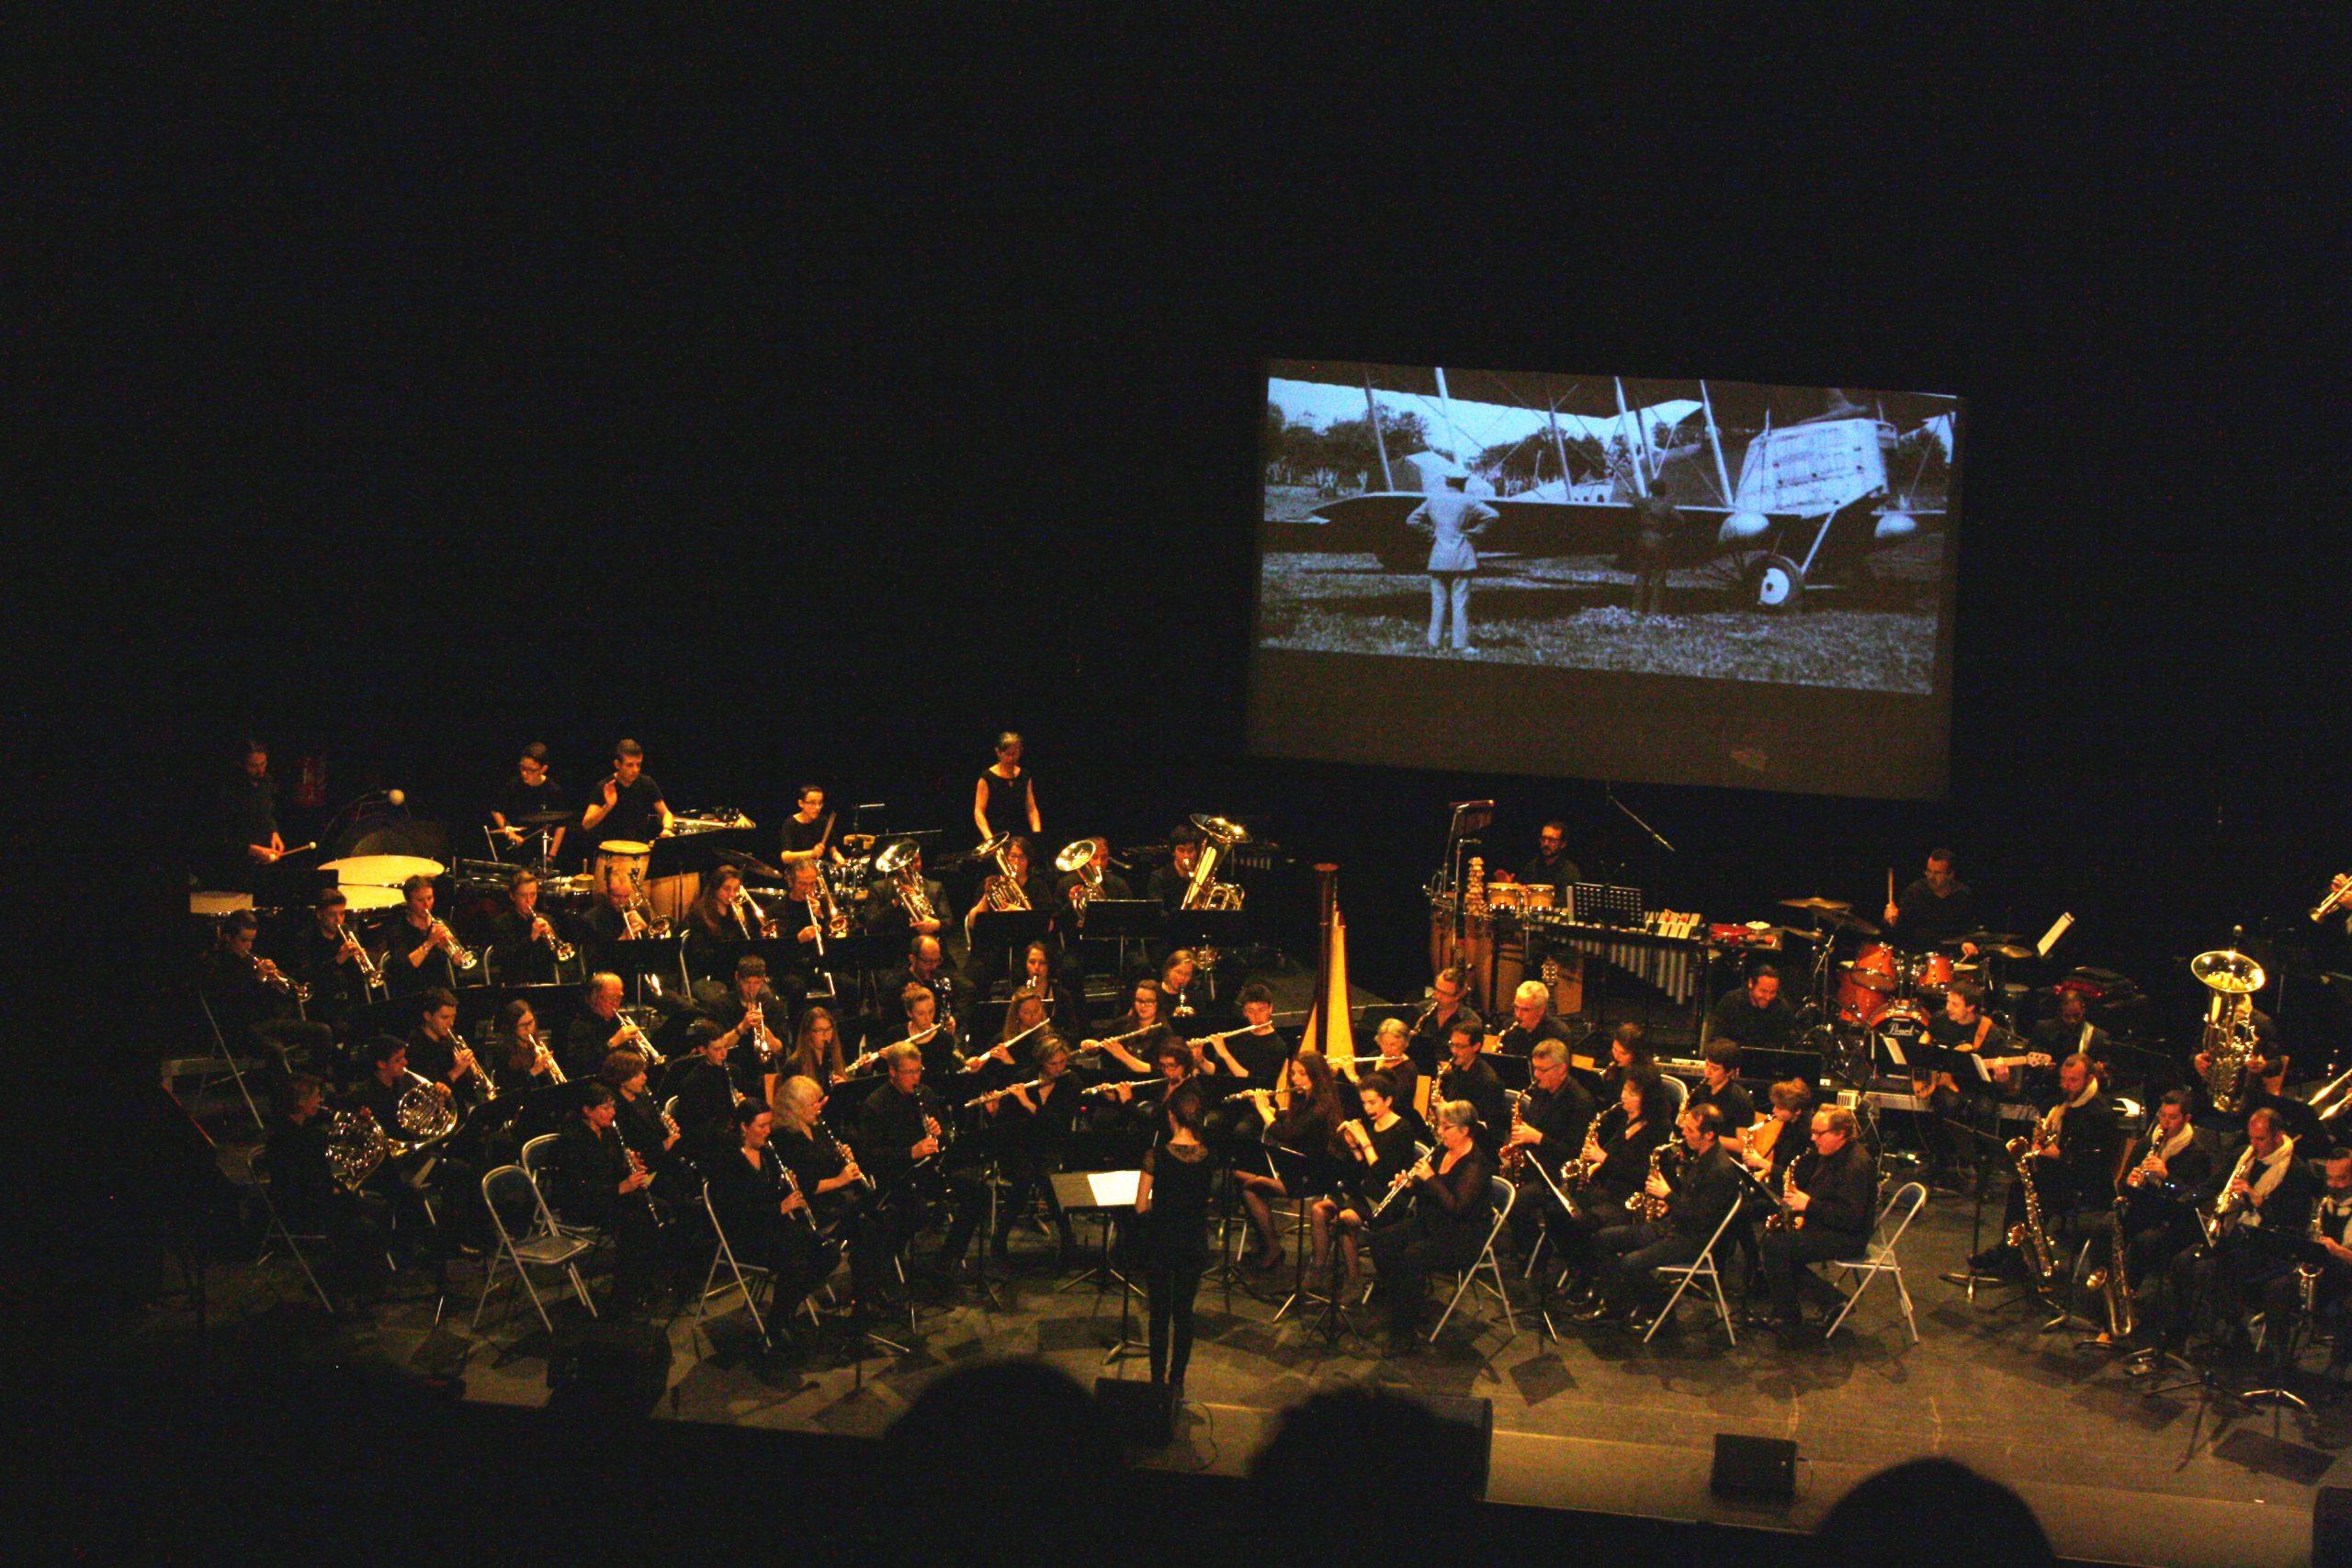 Drayen en concert avec Le A.L.O Big Band le 17 novembre à Bléré!